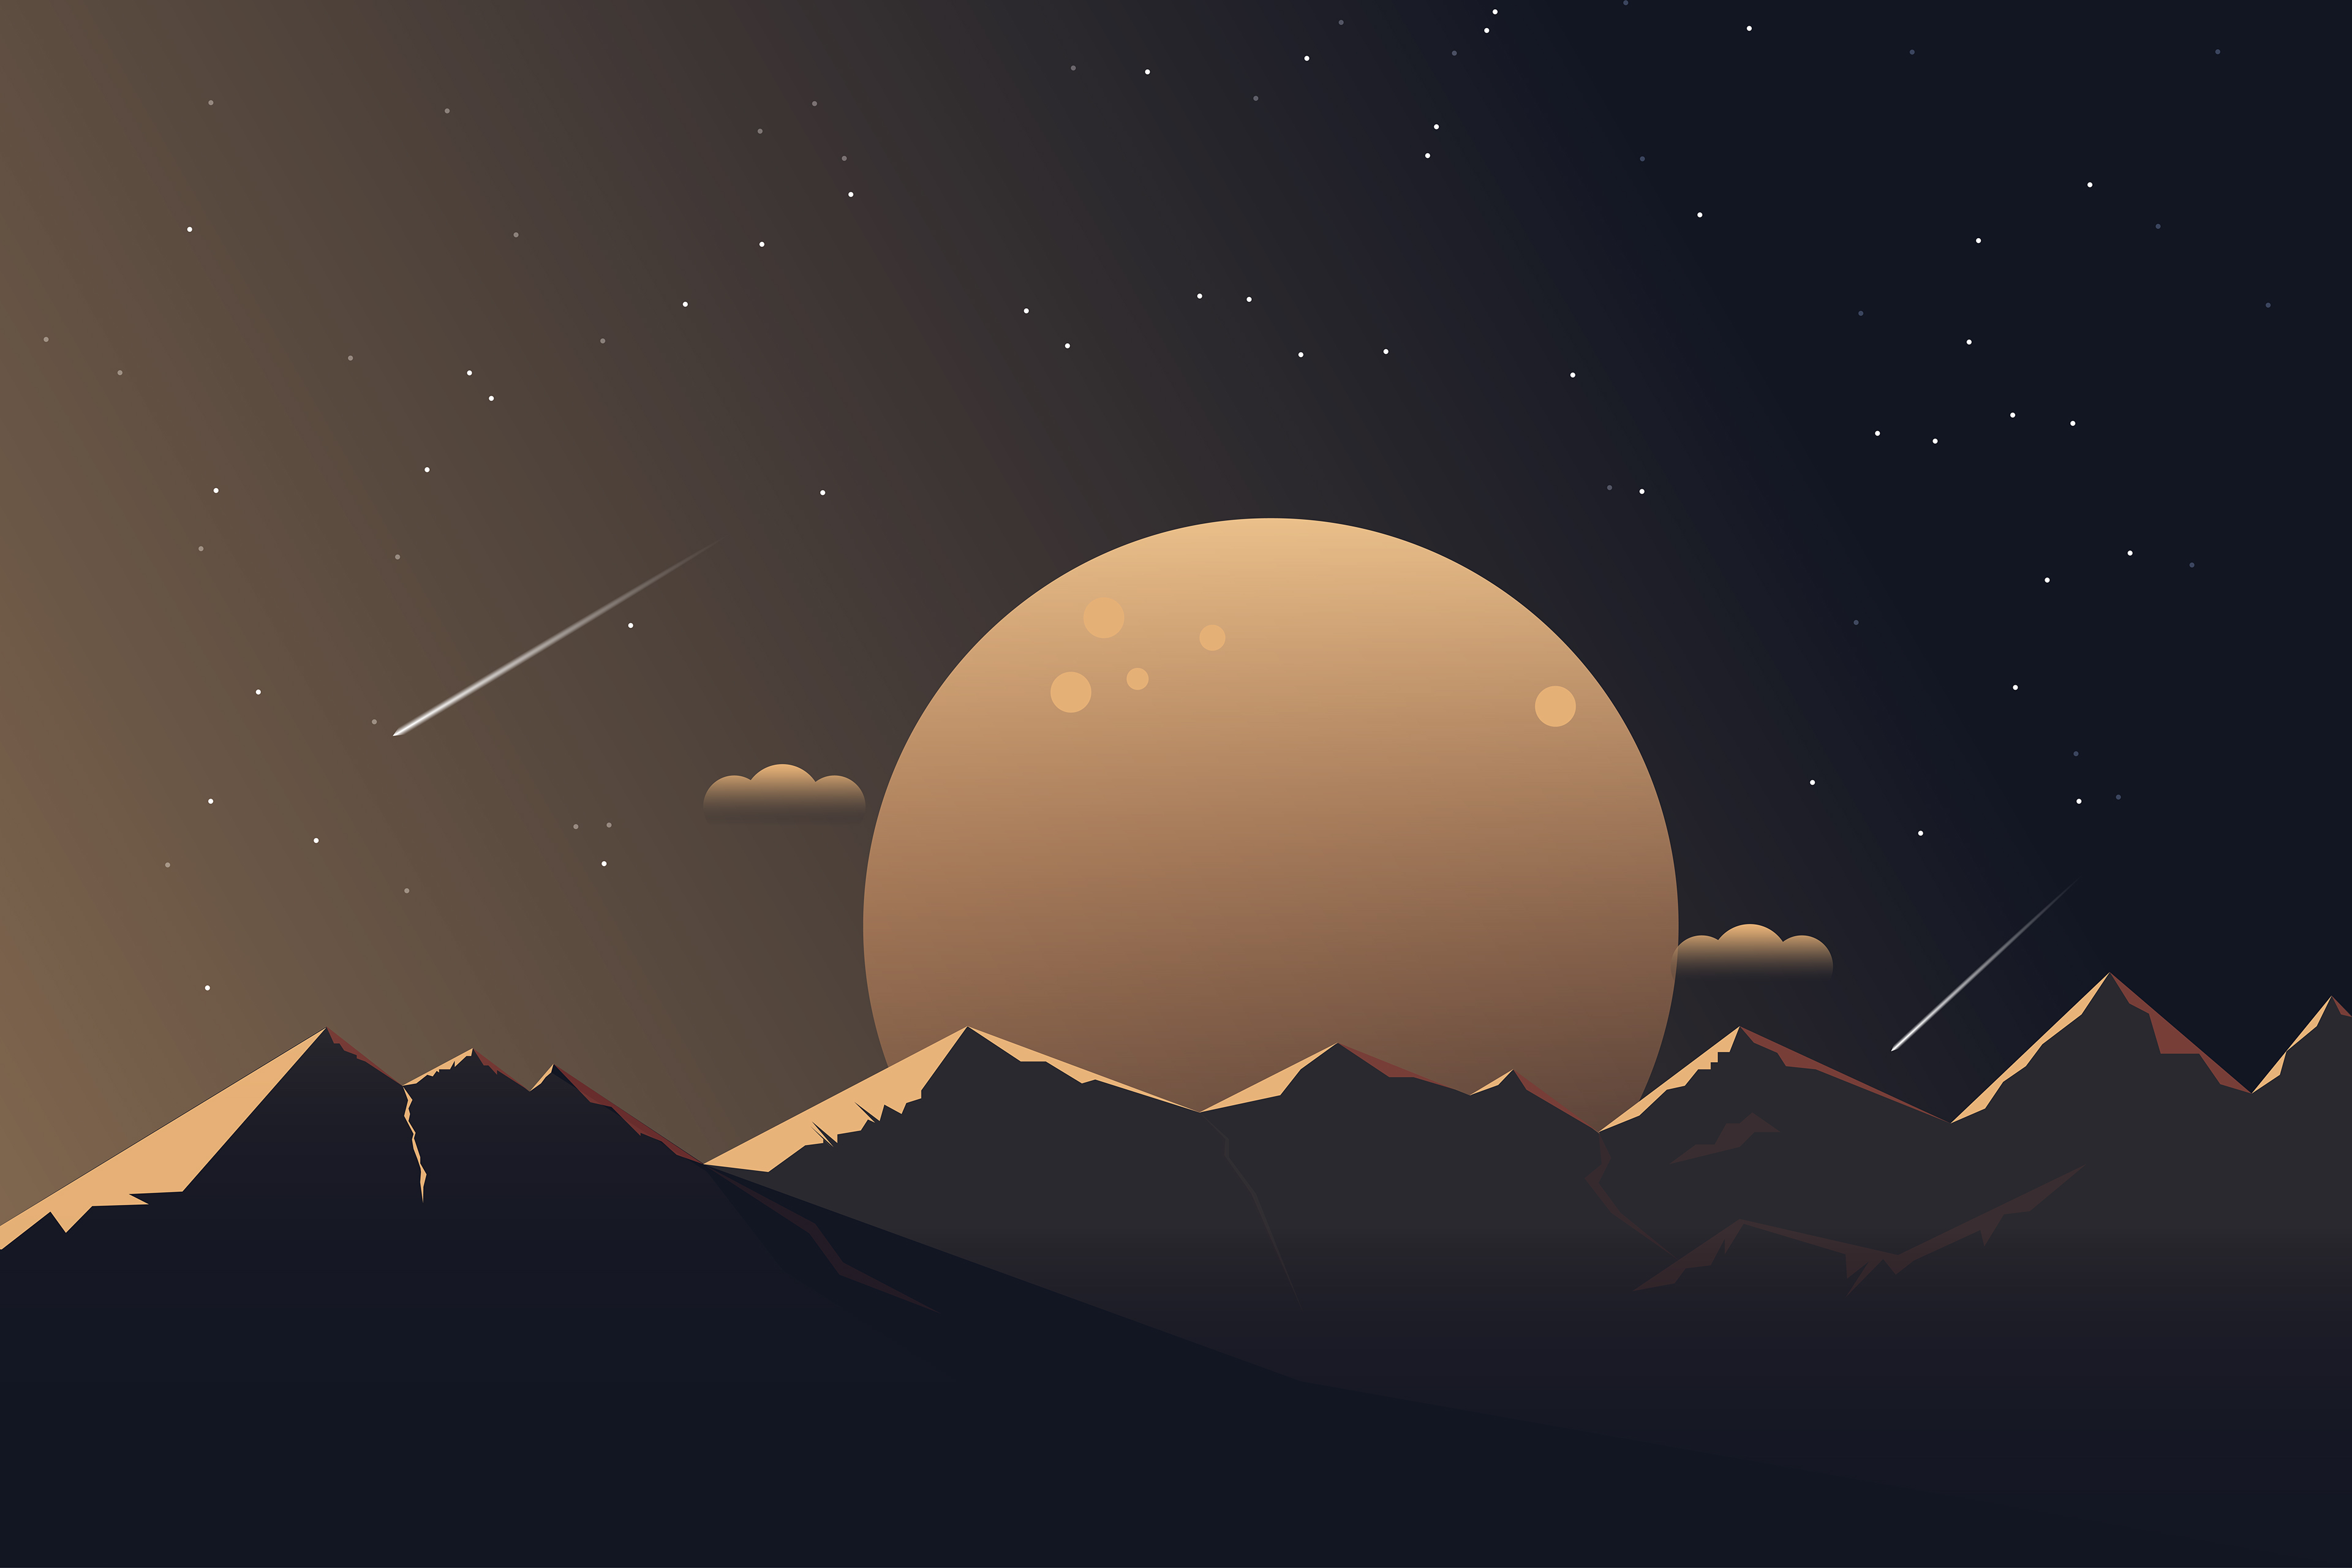 General 3840x2560 digital digital art artwork illustration minimalism sunset sunrise dusk dark nature landscape mountains Moon moonlight clouds stars night comet